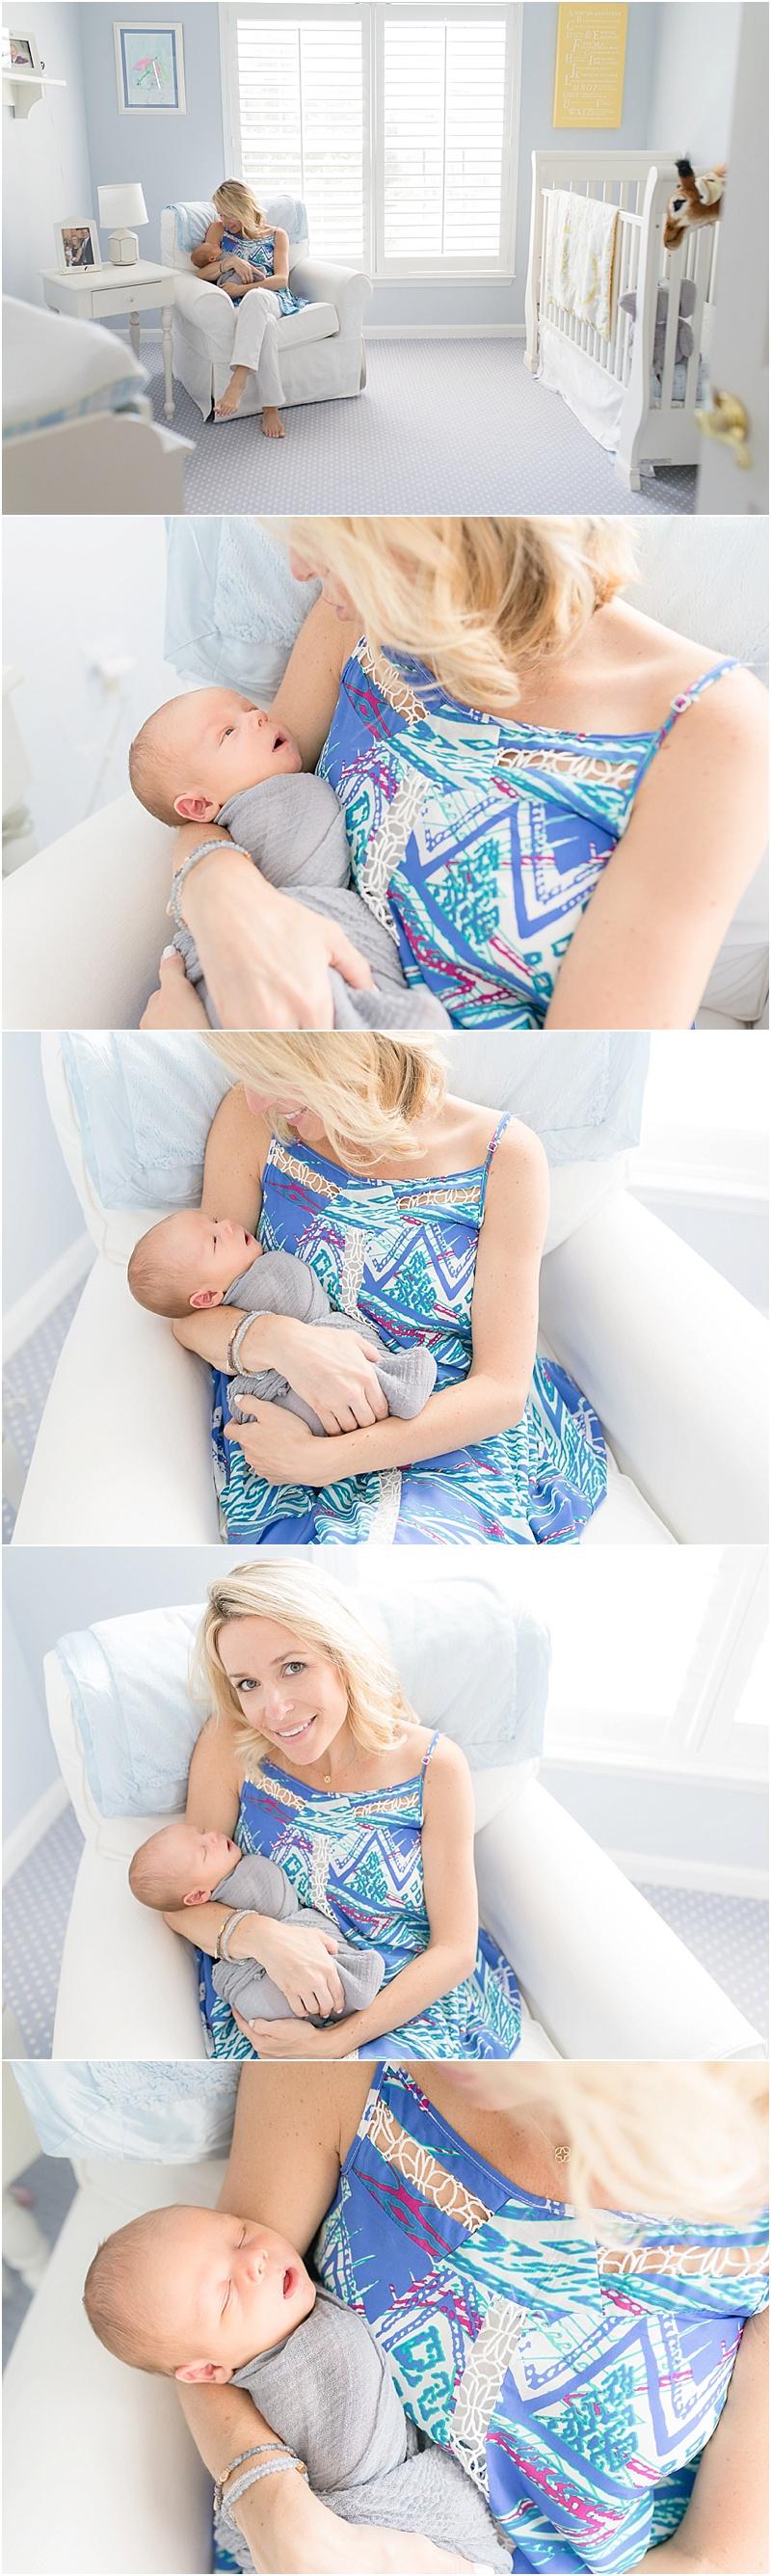 Lifestyle Newborn Session in Ashburn, VA | Kristin Cornely Photography